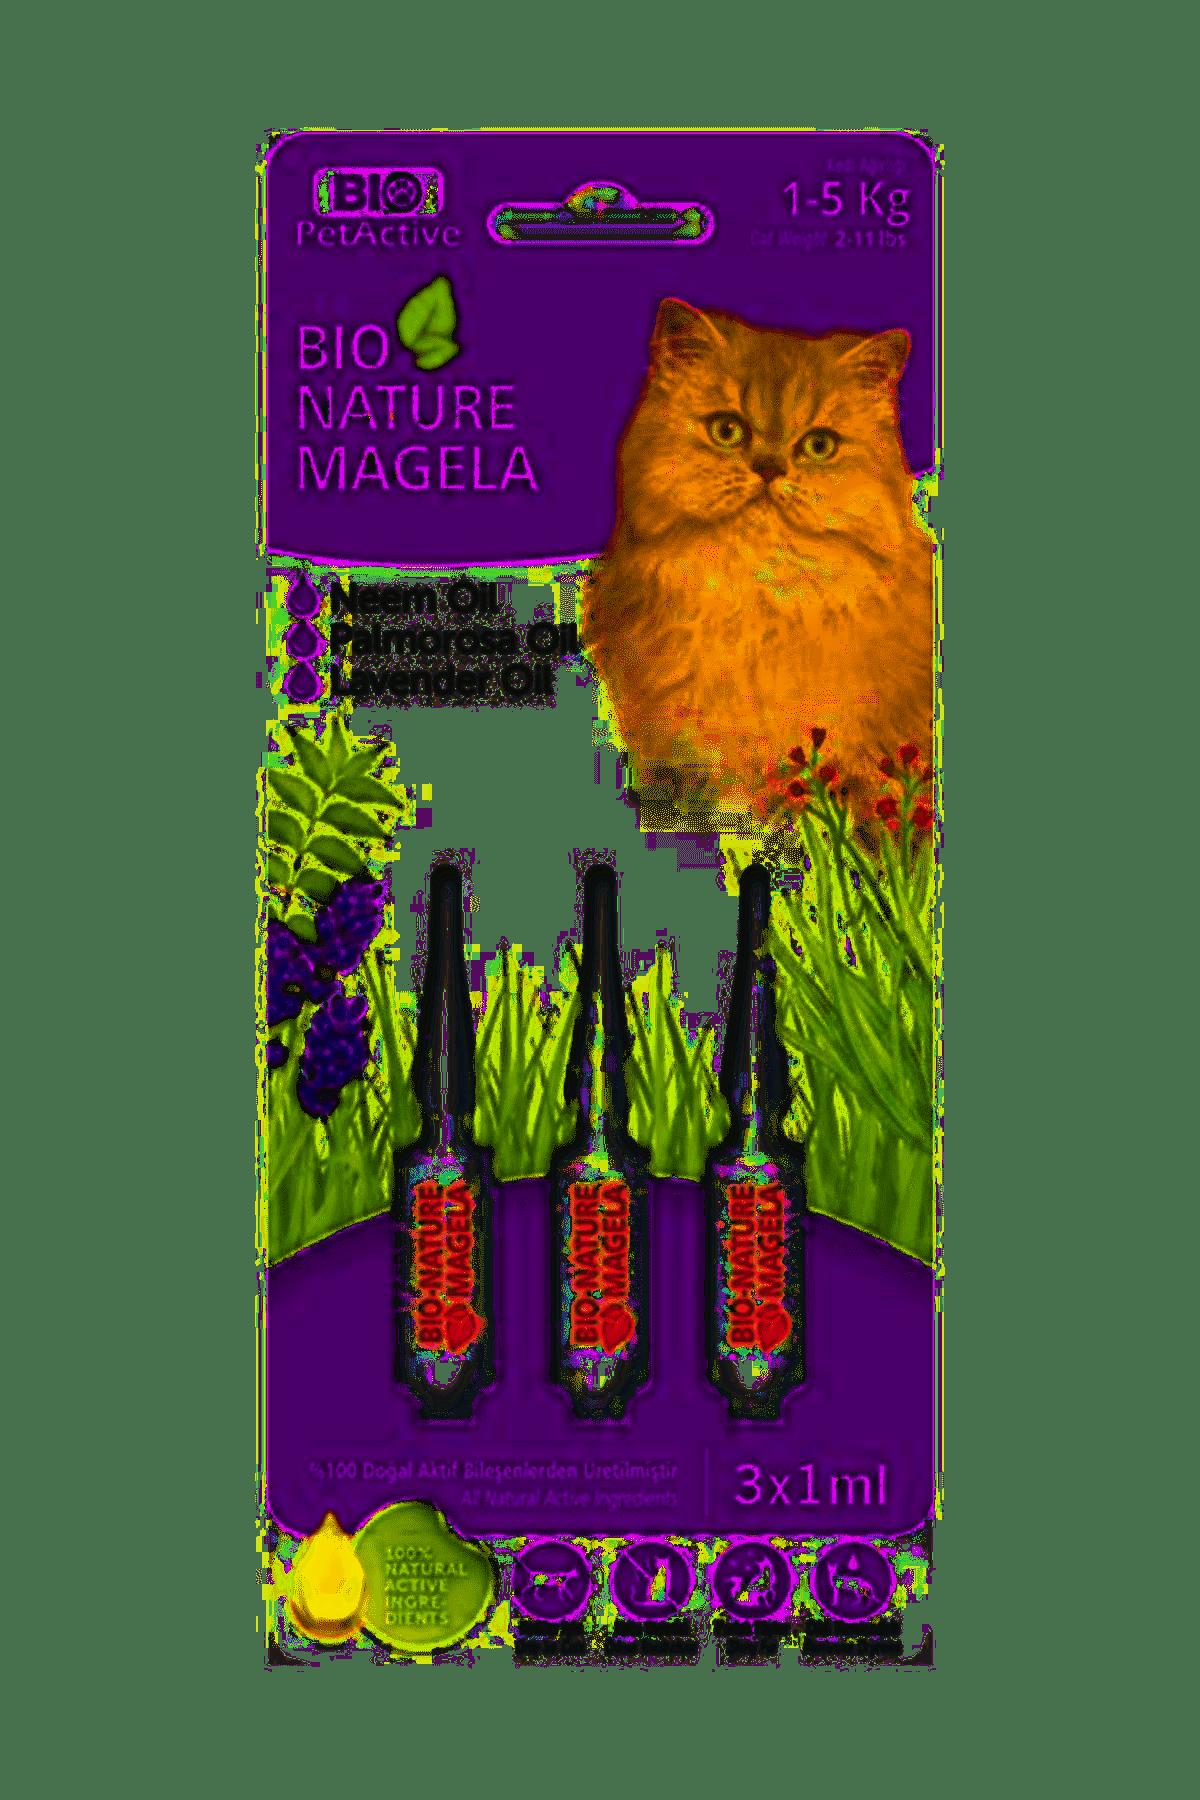 Bio Nature Magela Kedi Ense Damlası 1-5 Kg 3x1 ml